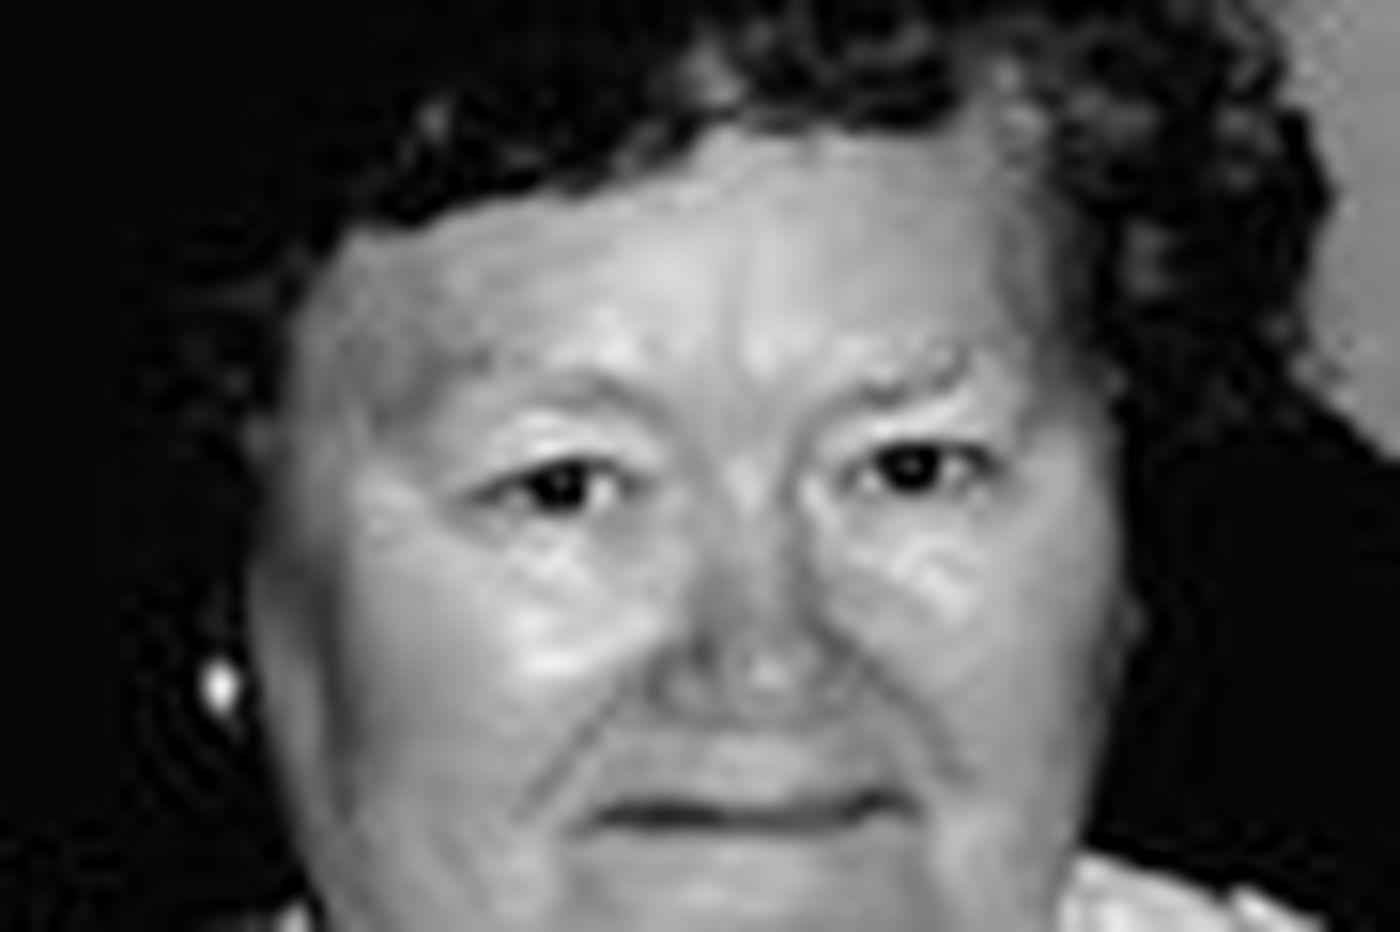 Lillian R. Glaudel | Registered nurse, 78